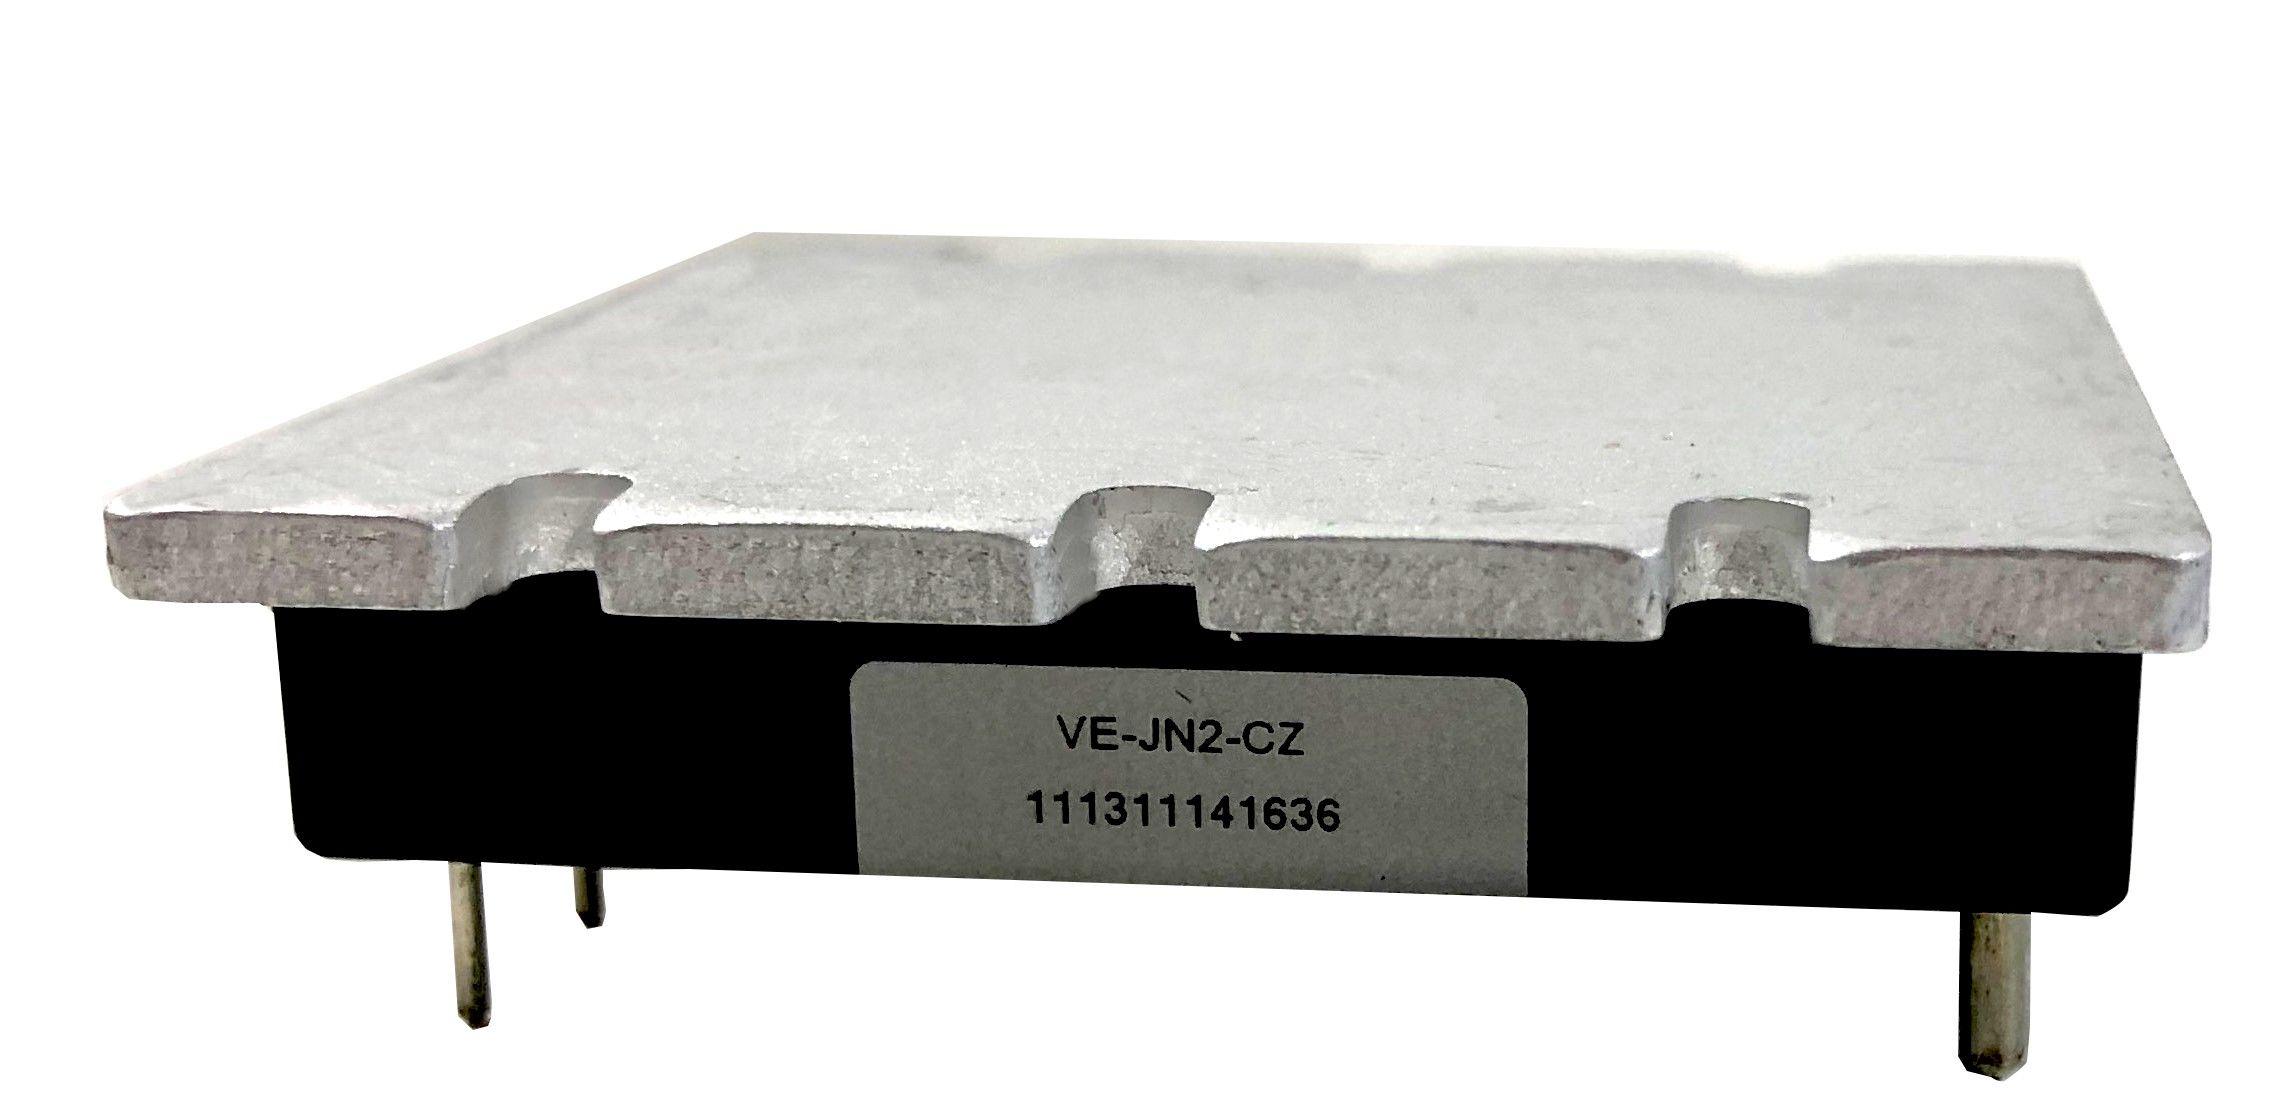 Vicor DC-DC Converter VI-JN2-CZ-ND 111311141636 000008969515 1.67A 15V 25W